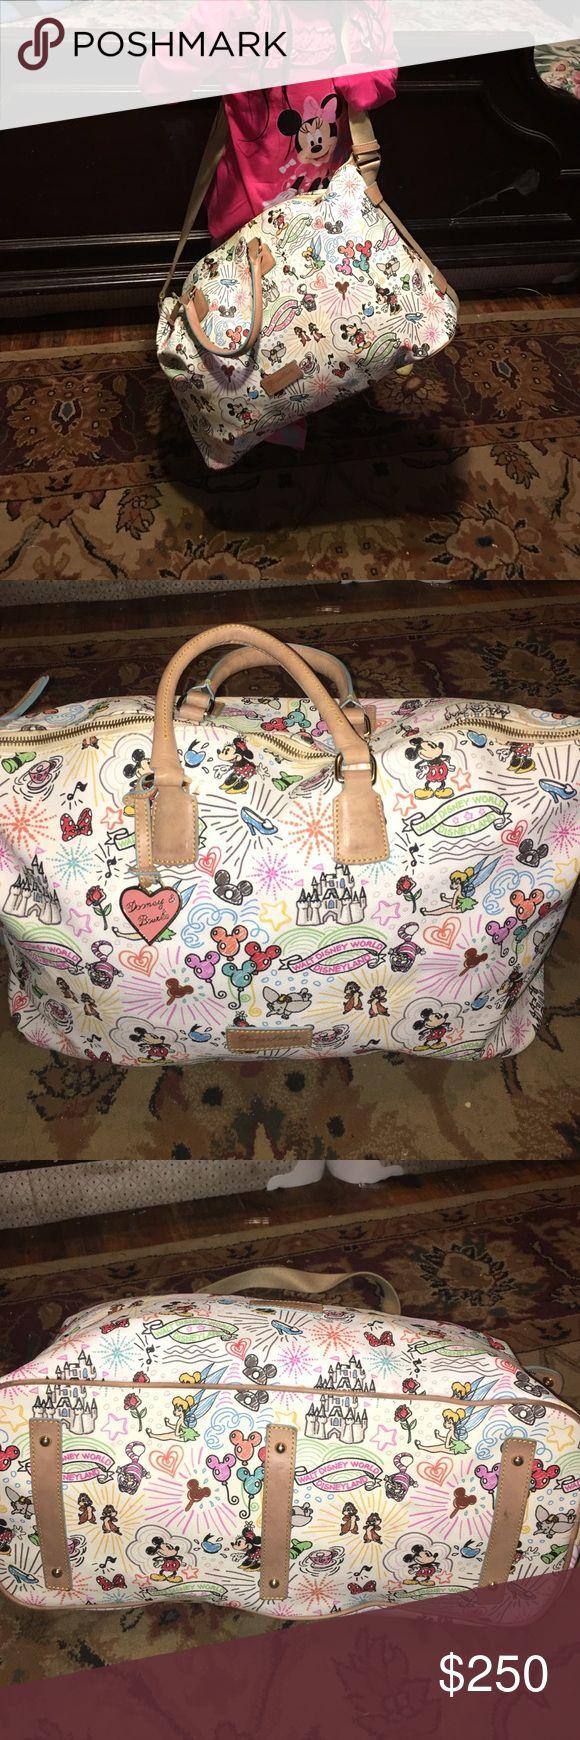 Disney Dooney and Bourke duffle weekender tote bag used but no tears or stains Dooney & Bourke Bags Travel Bags